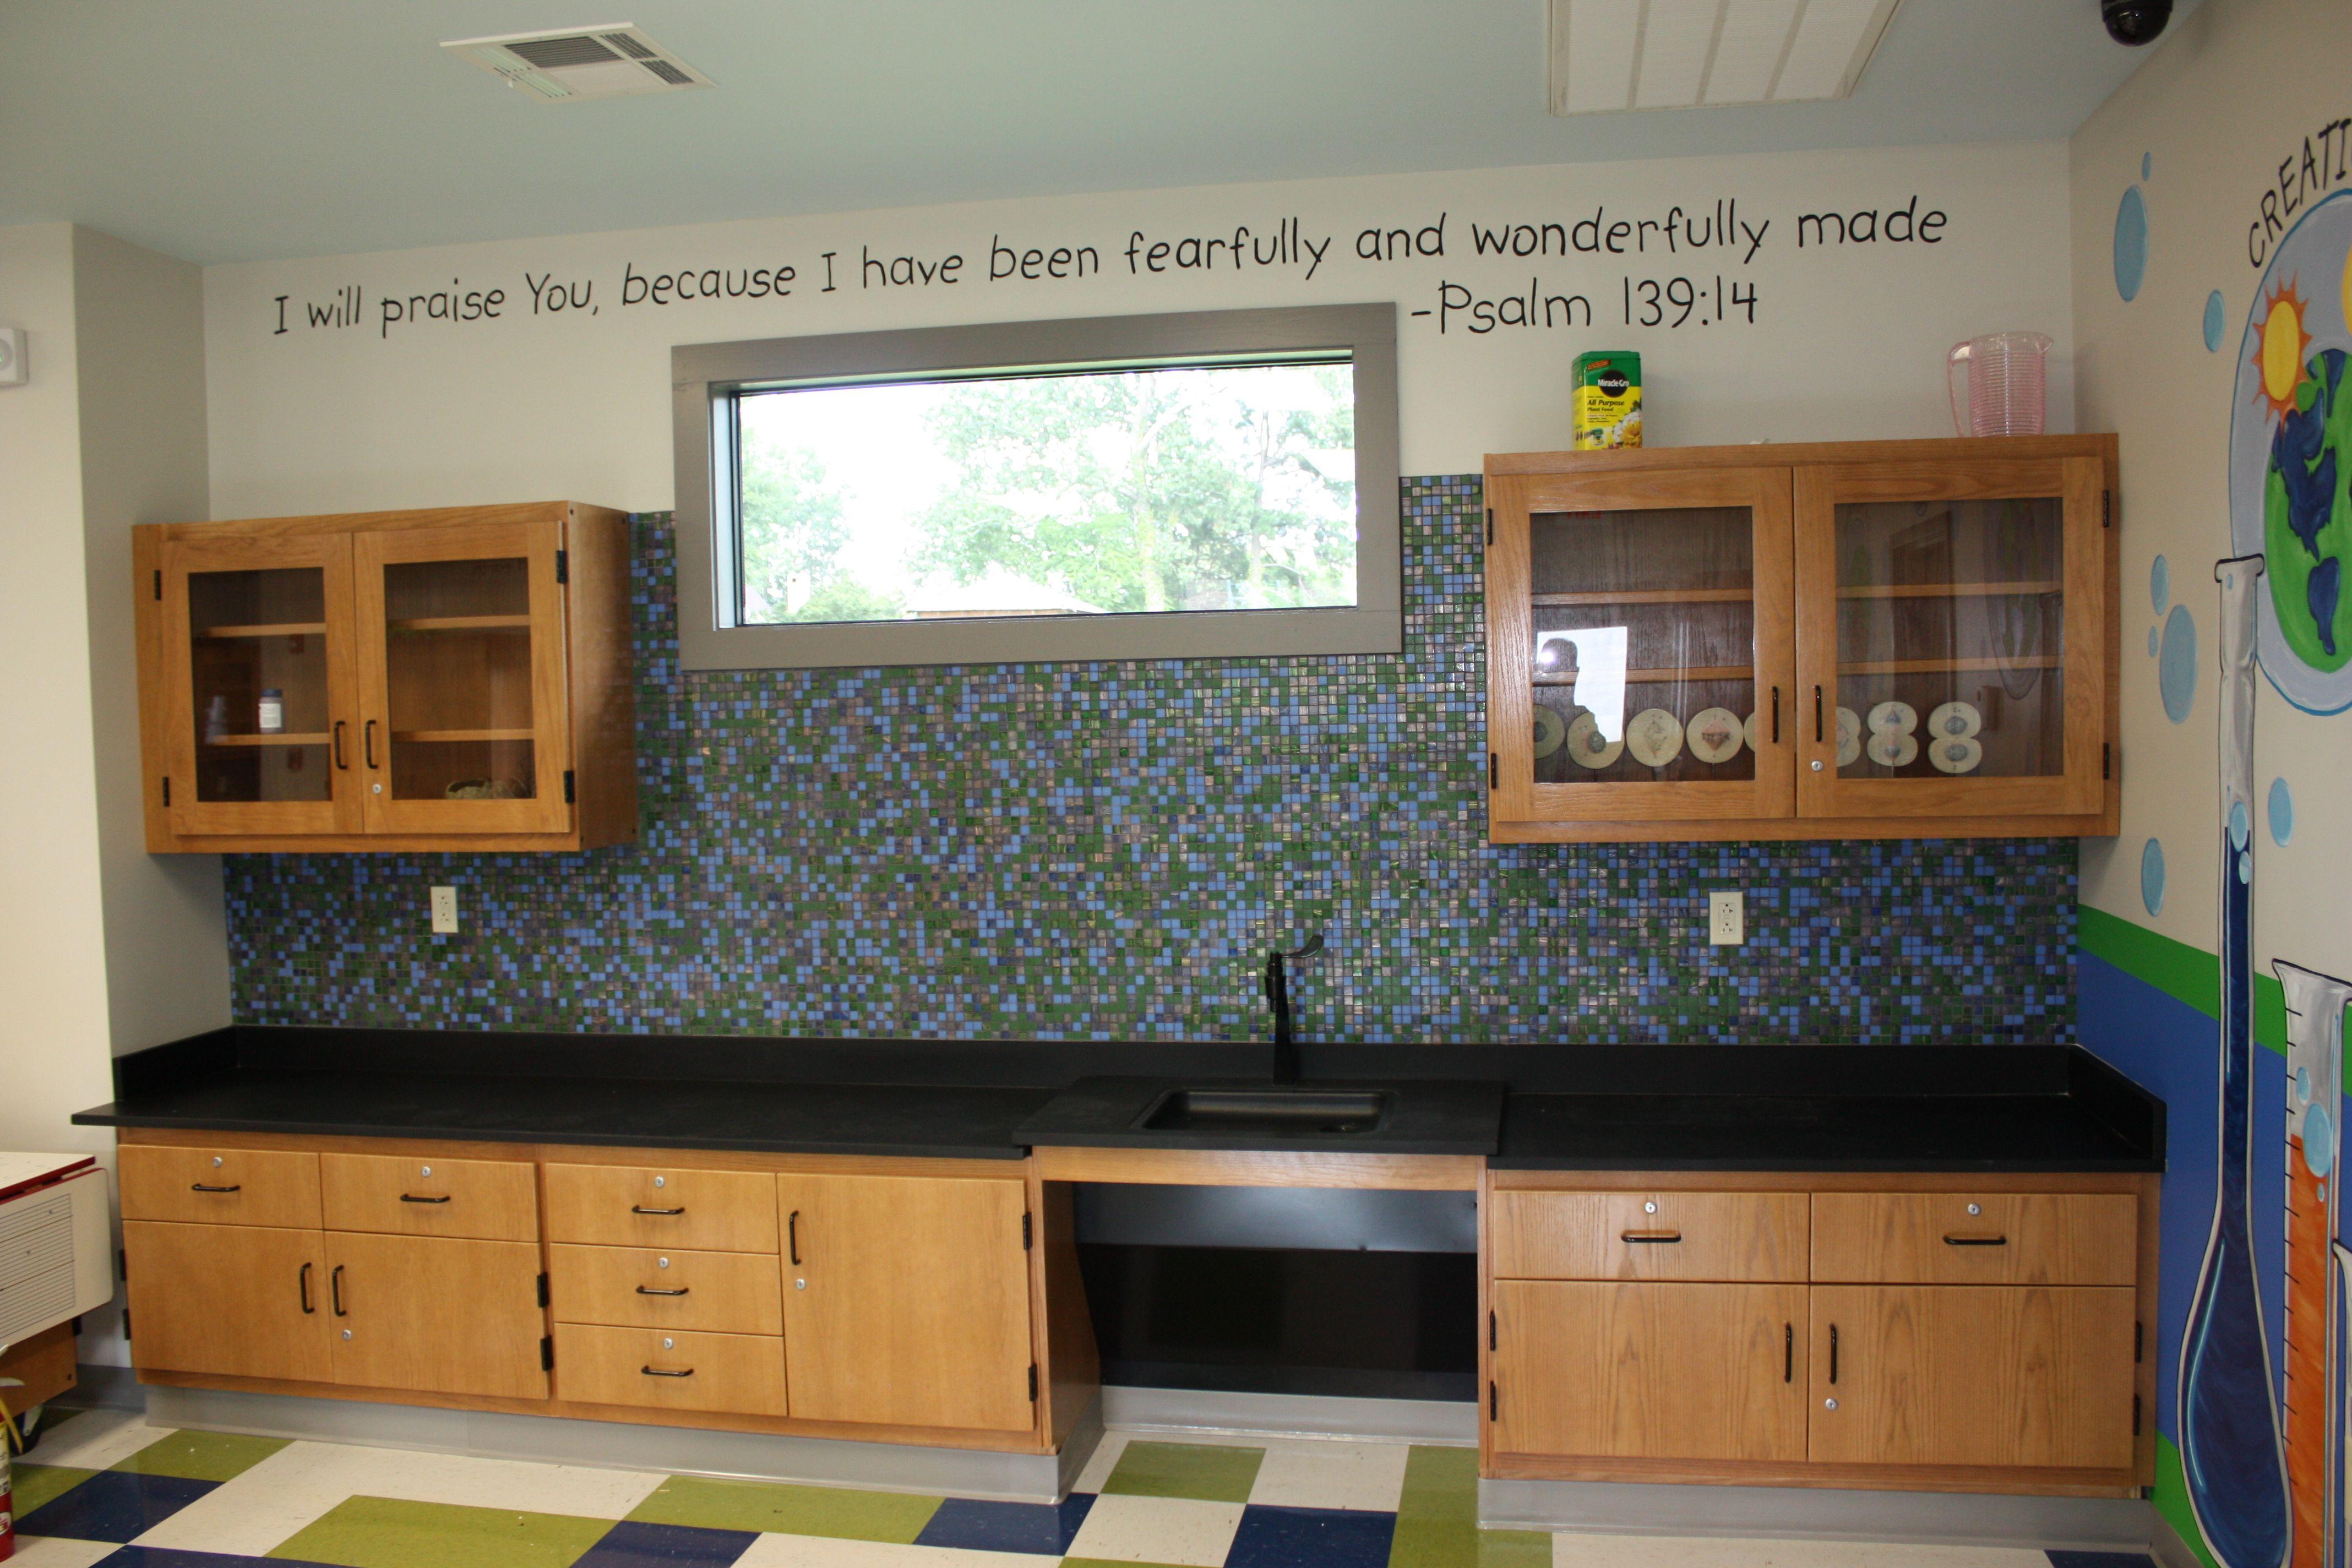 Check Out The Tile Backsplash First Presbyterian Day School